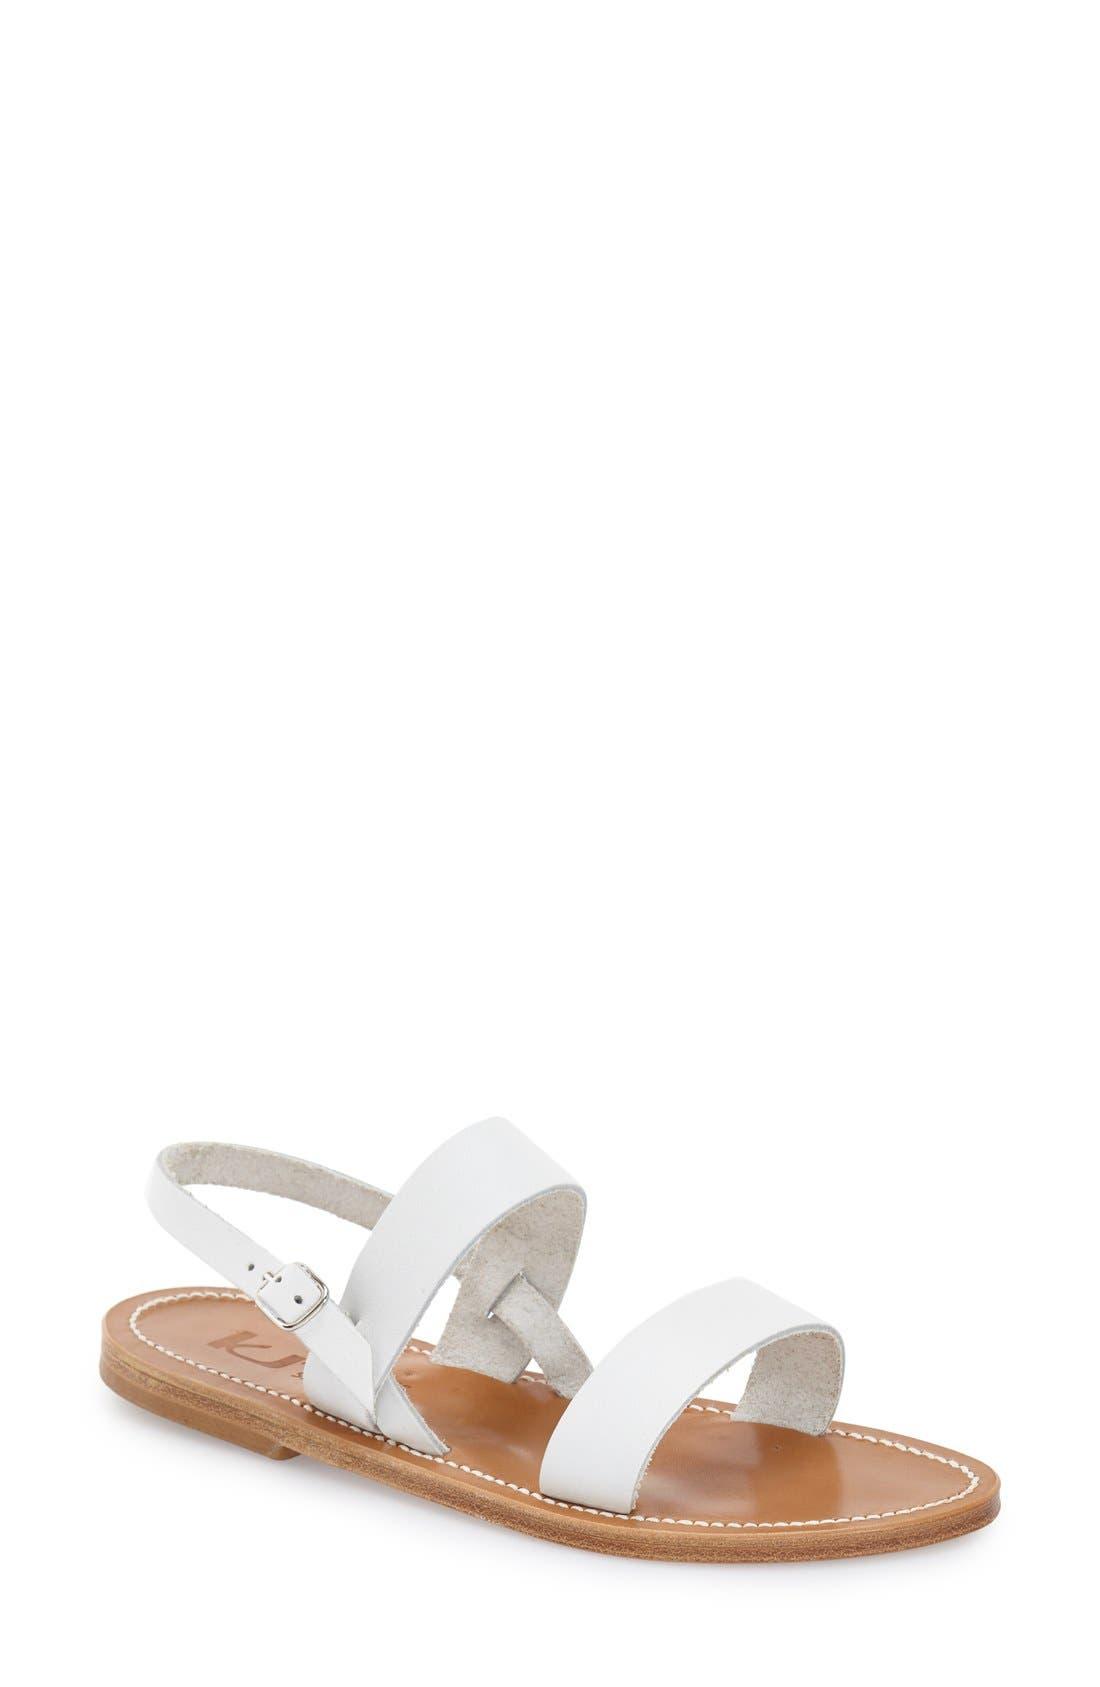 Alternate Image 1 Selected - K Jacques St. Tropez Flat 'Barigoule' Vachetta Leather Sandal